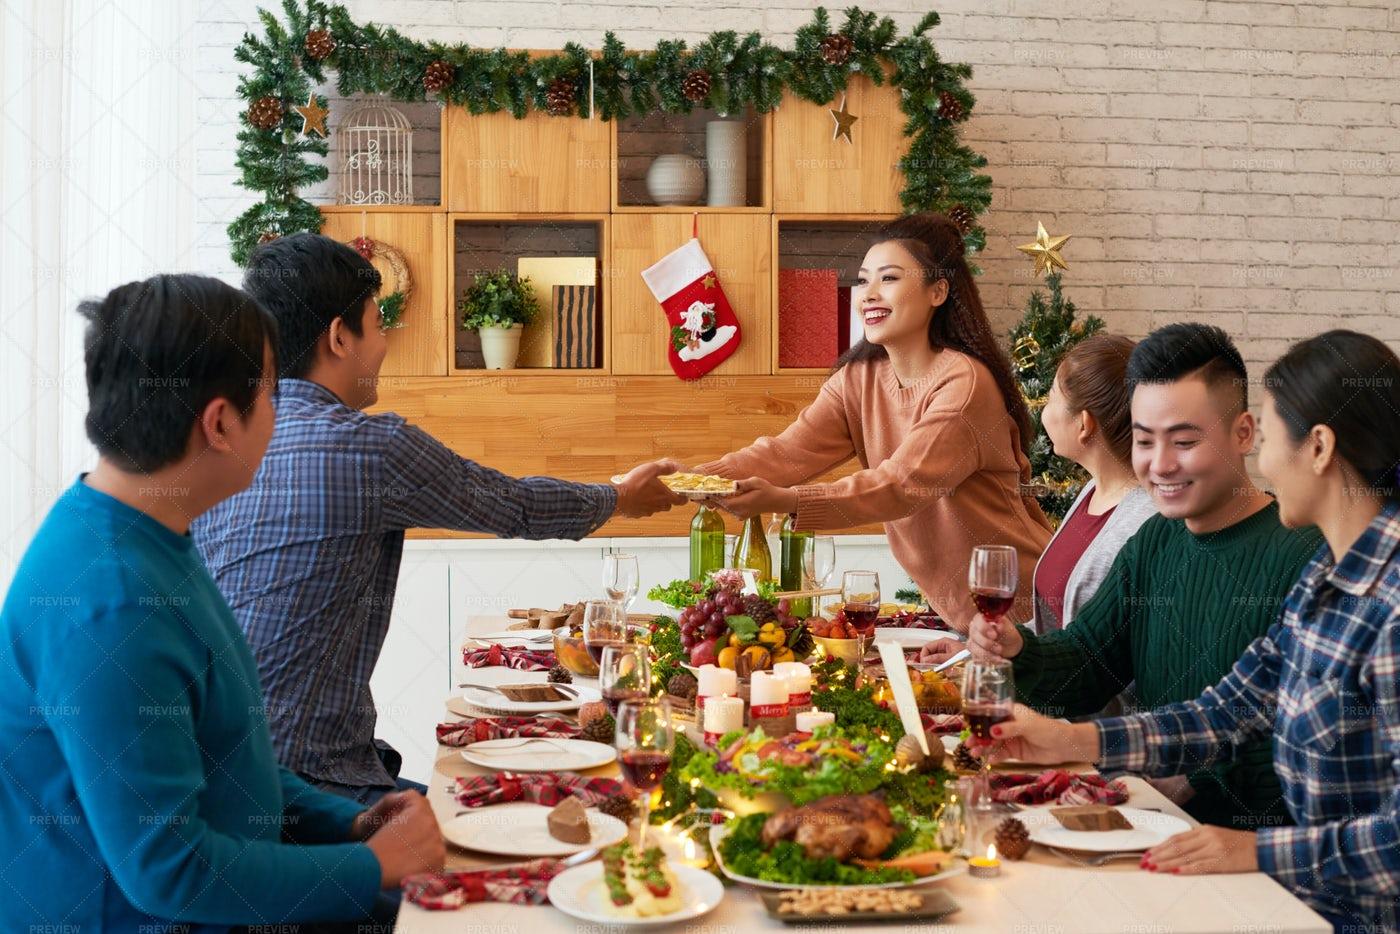 Friends Celebrating Christmas: Stock Photos